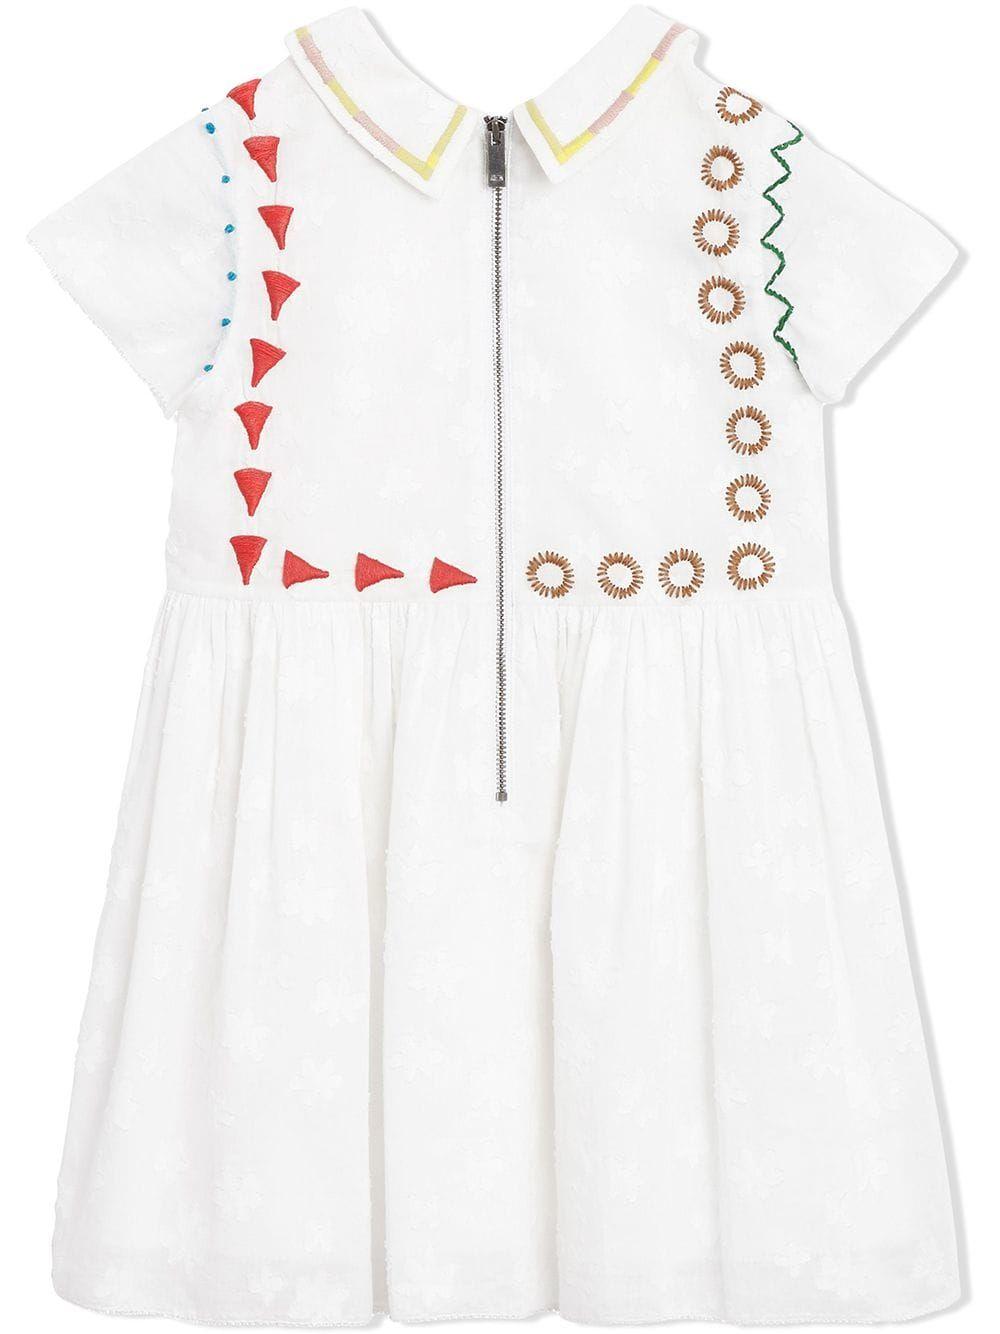 83b89a935 Burberry Kids Peter Pan Collar Embroidered Cotton Dress